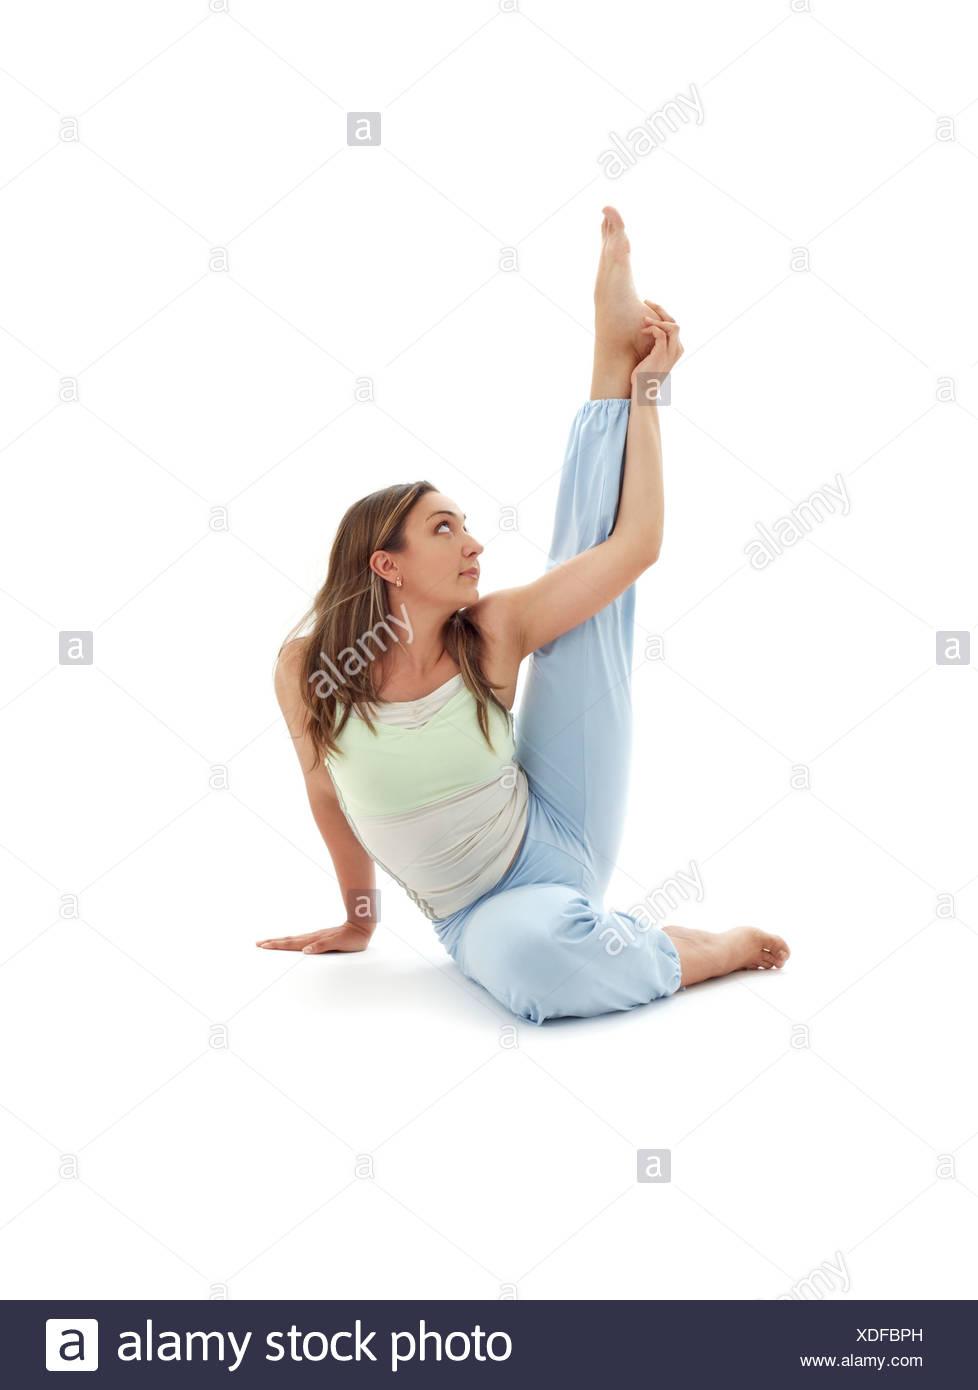 girl practicing krounchasana heron pose over white - Stock Image